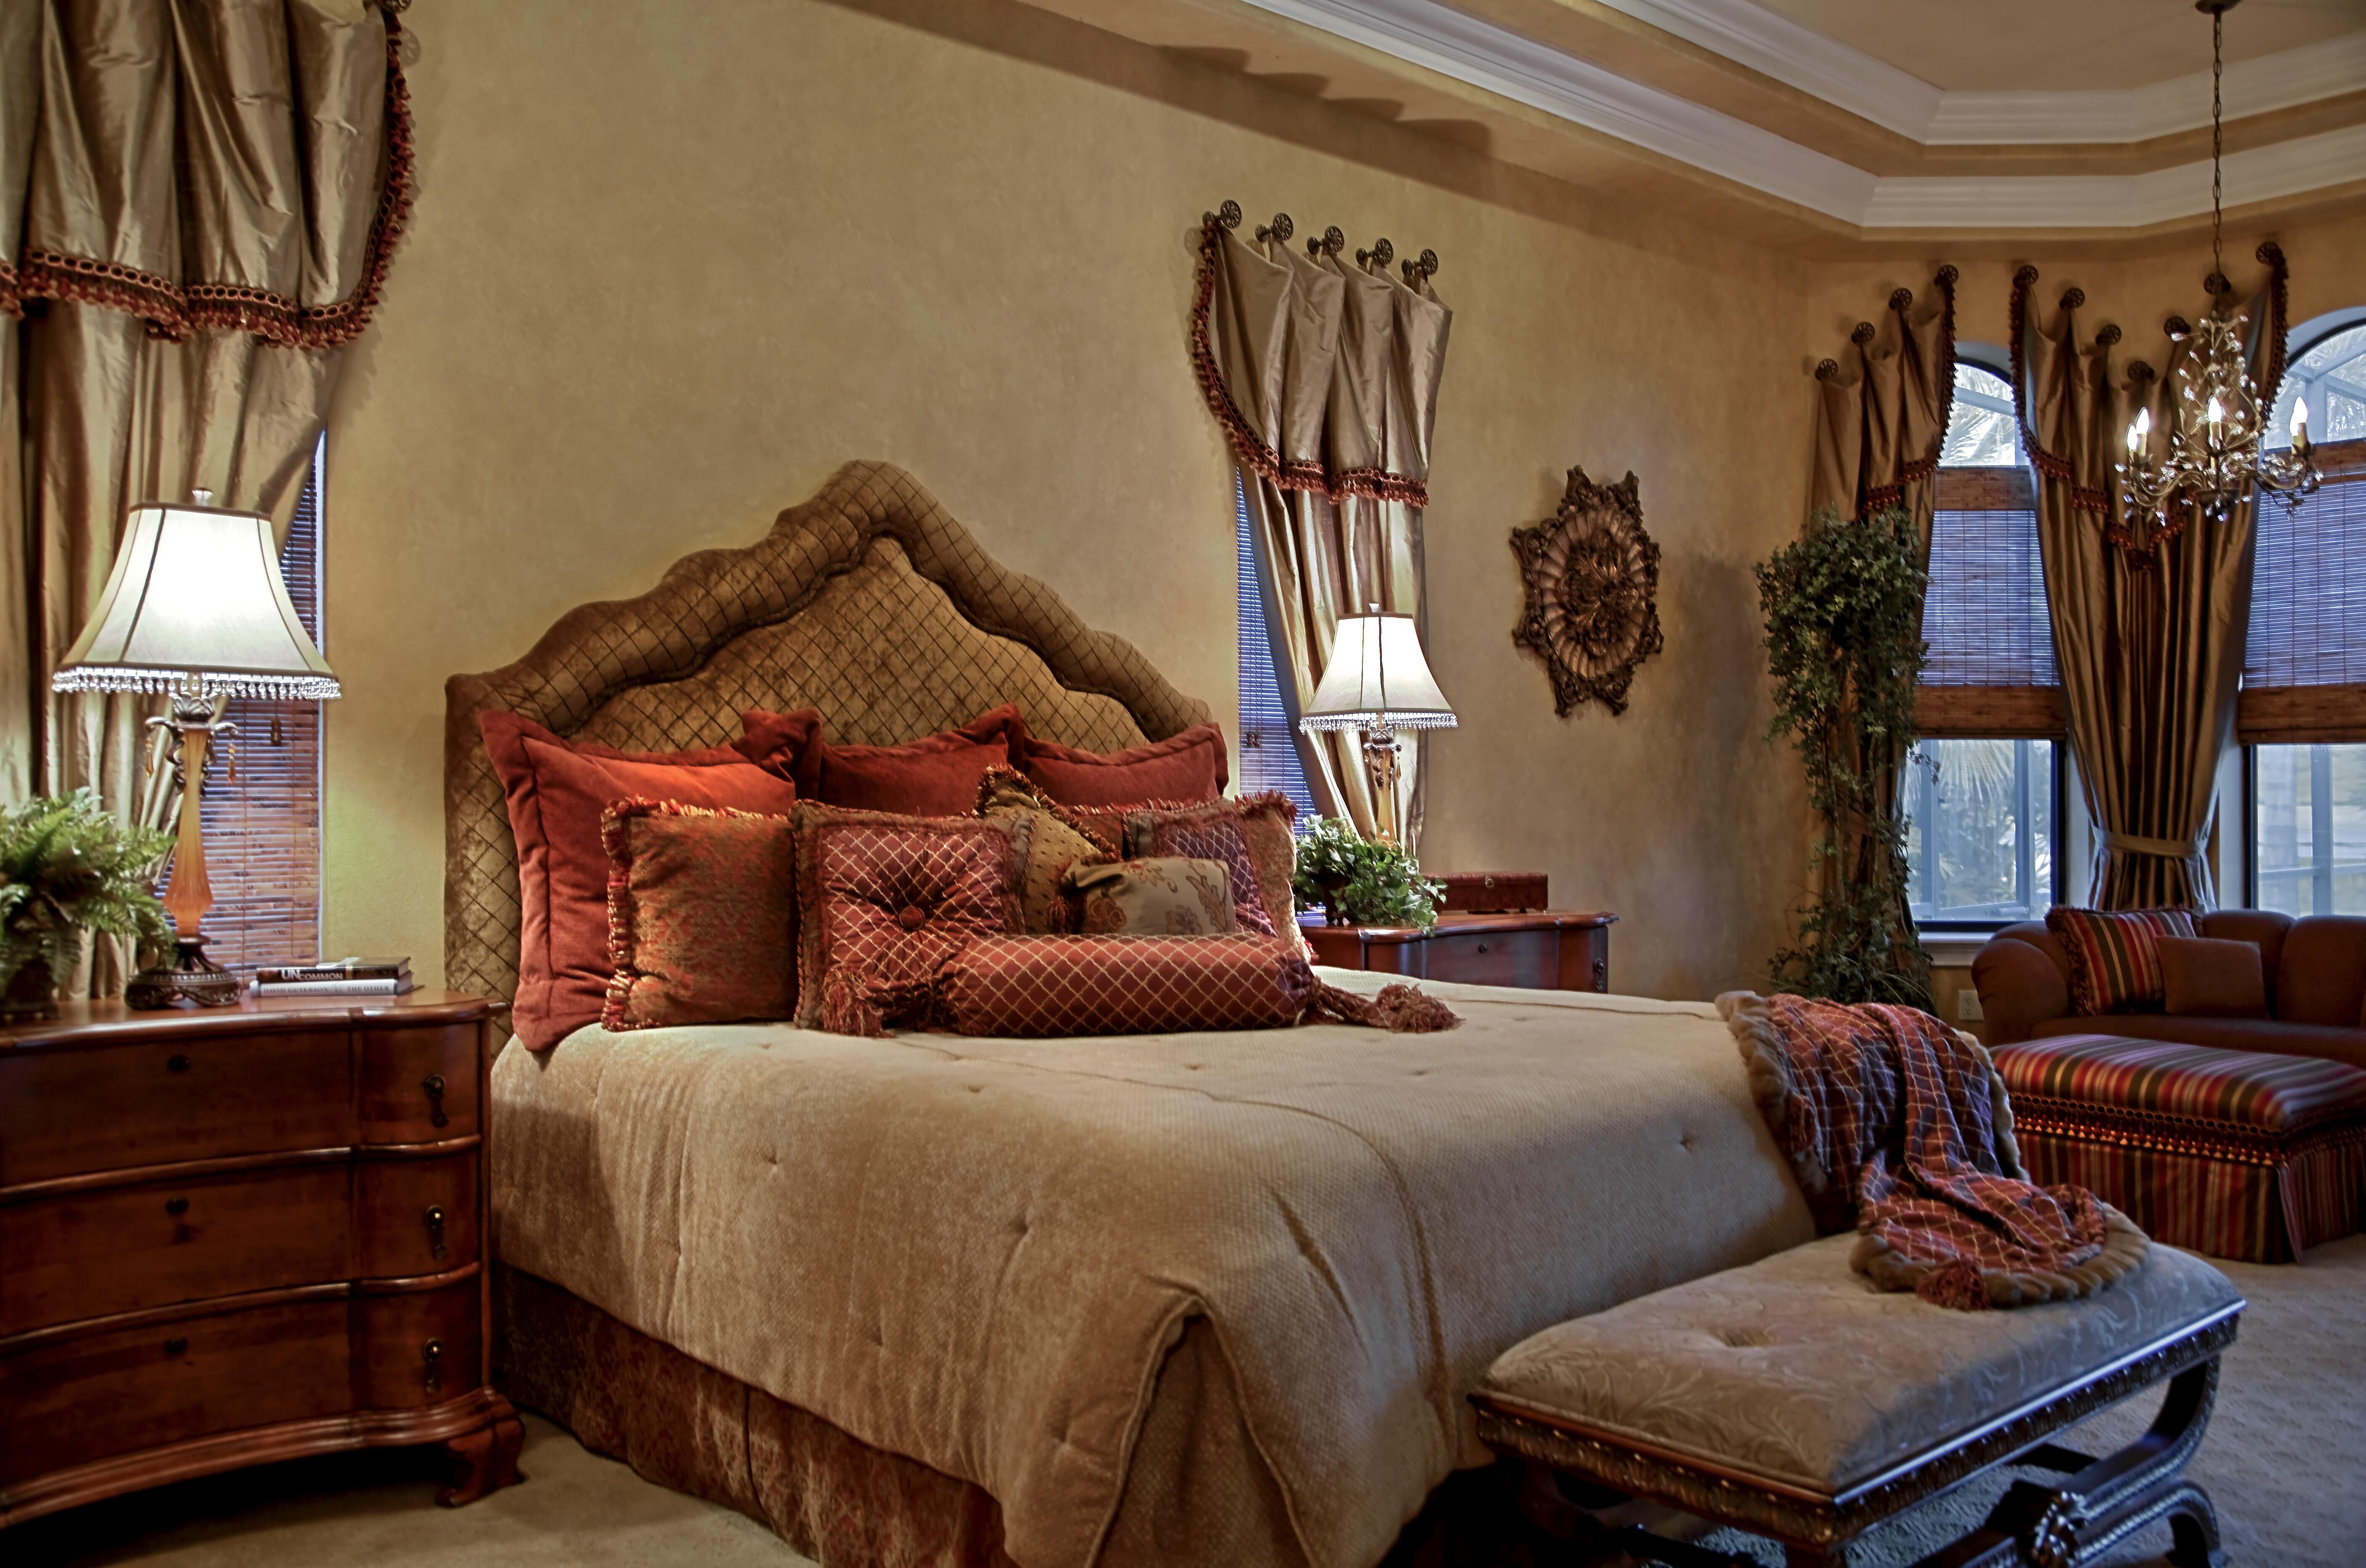 tampa-interior-decorators-old-world-charm-bedroom-terri-white